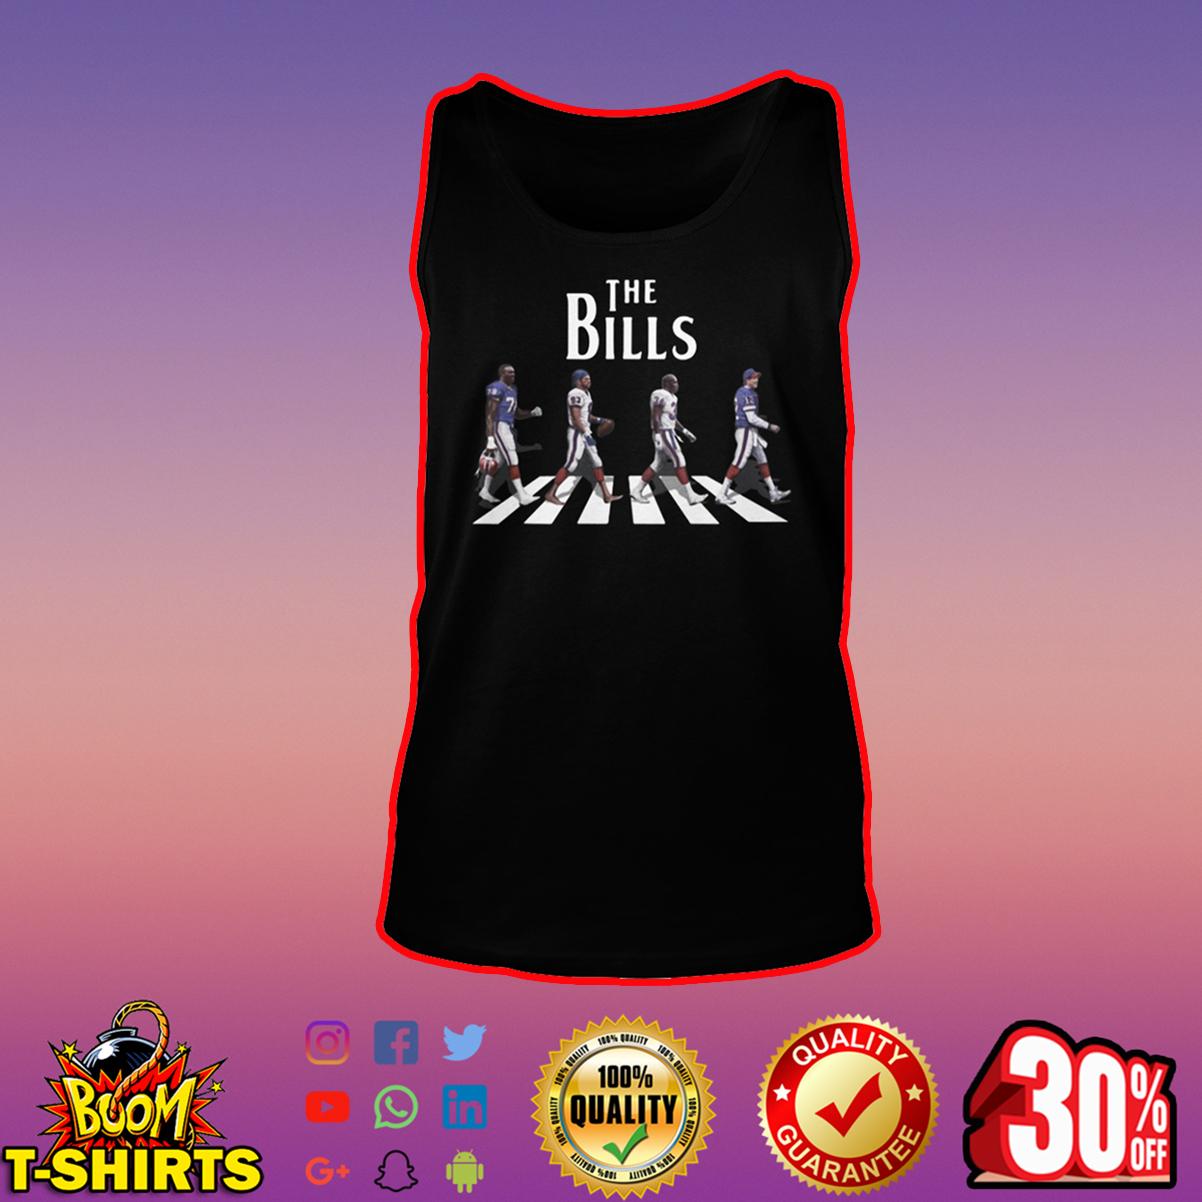 The Bills Abbey Road tank top